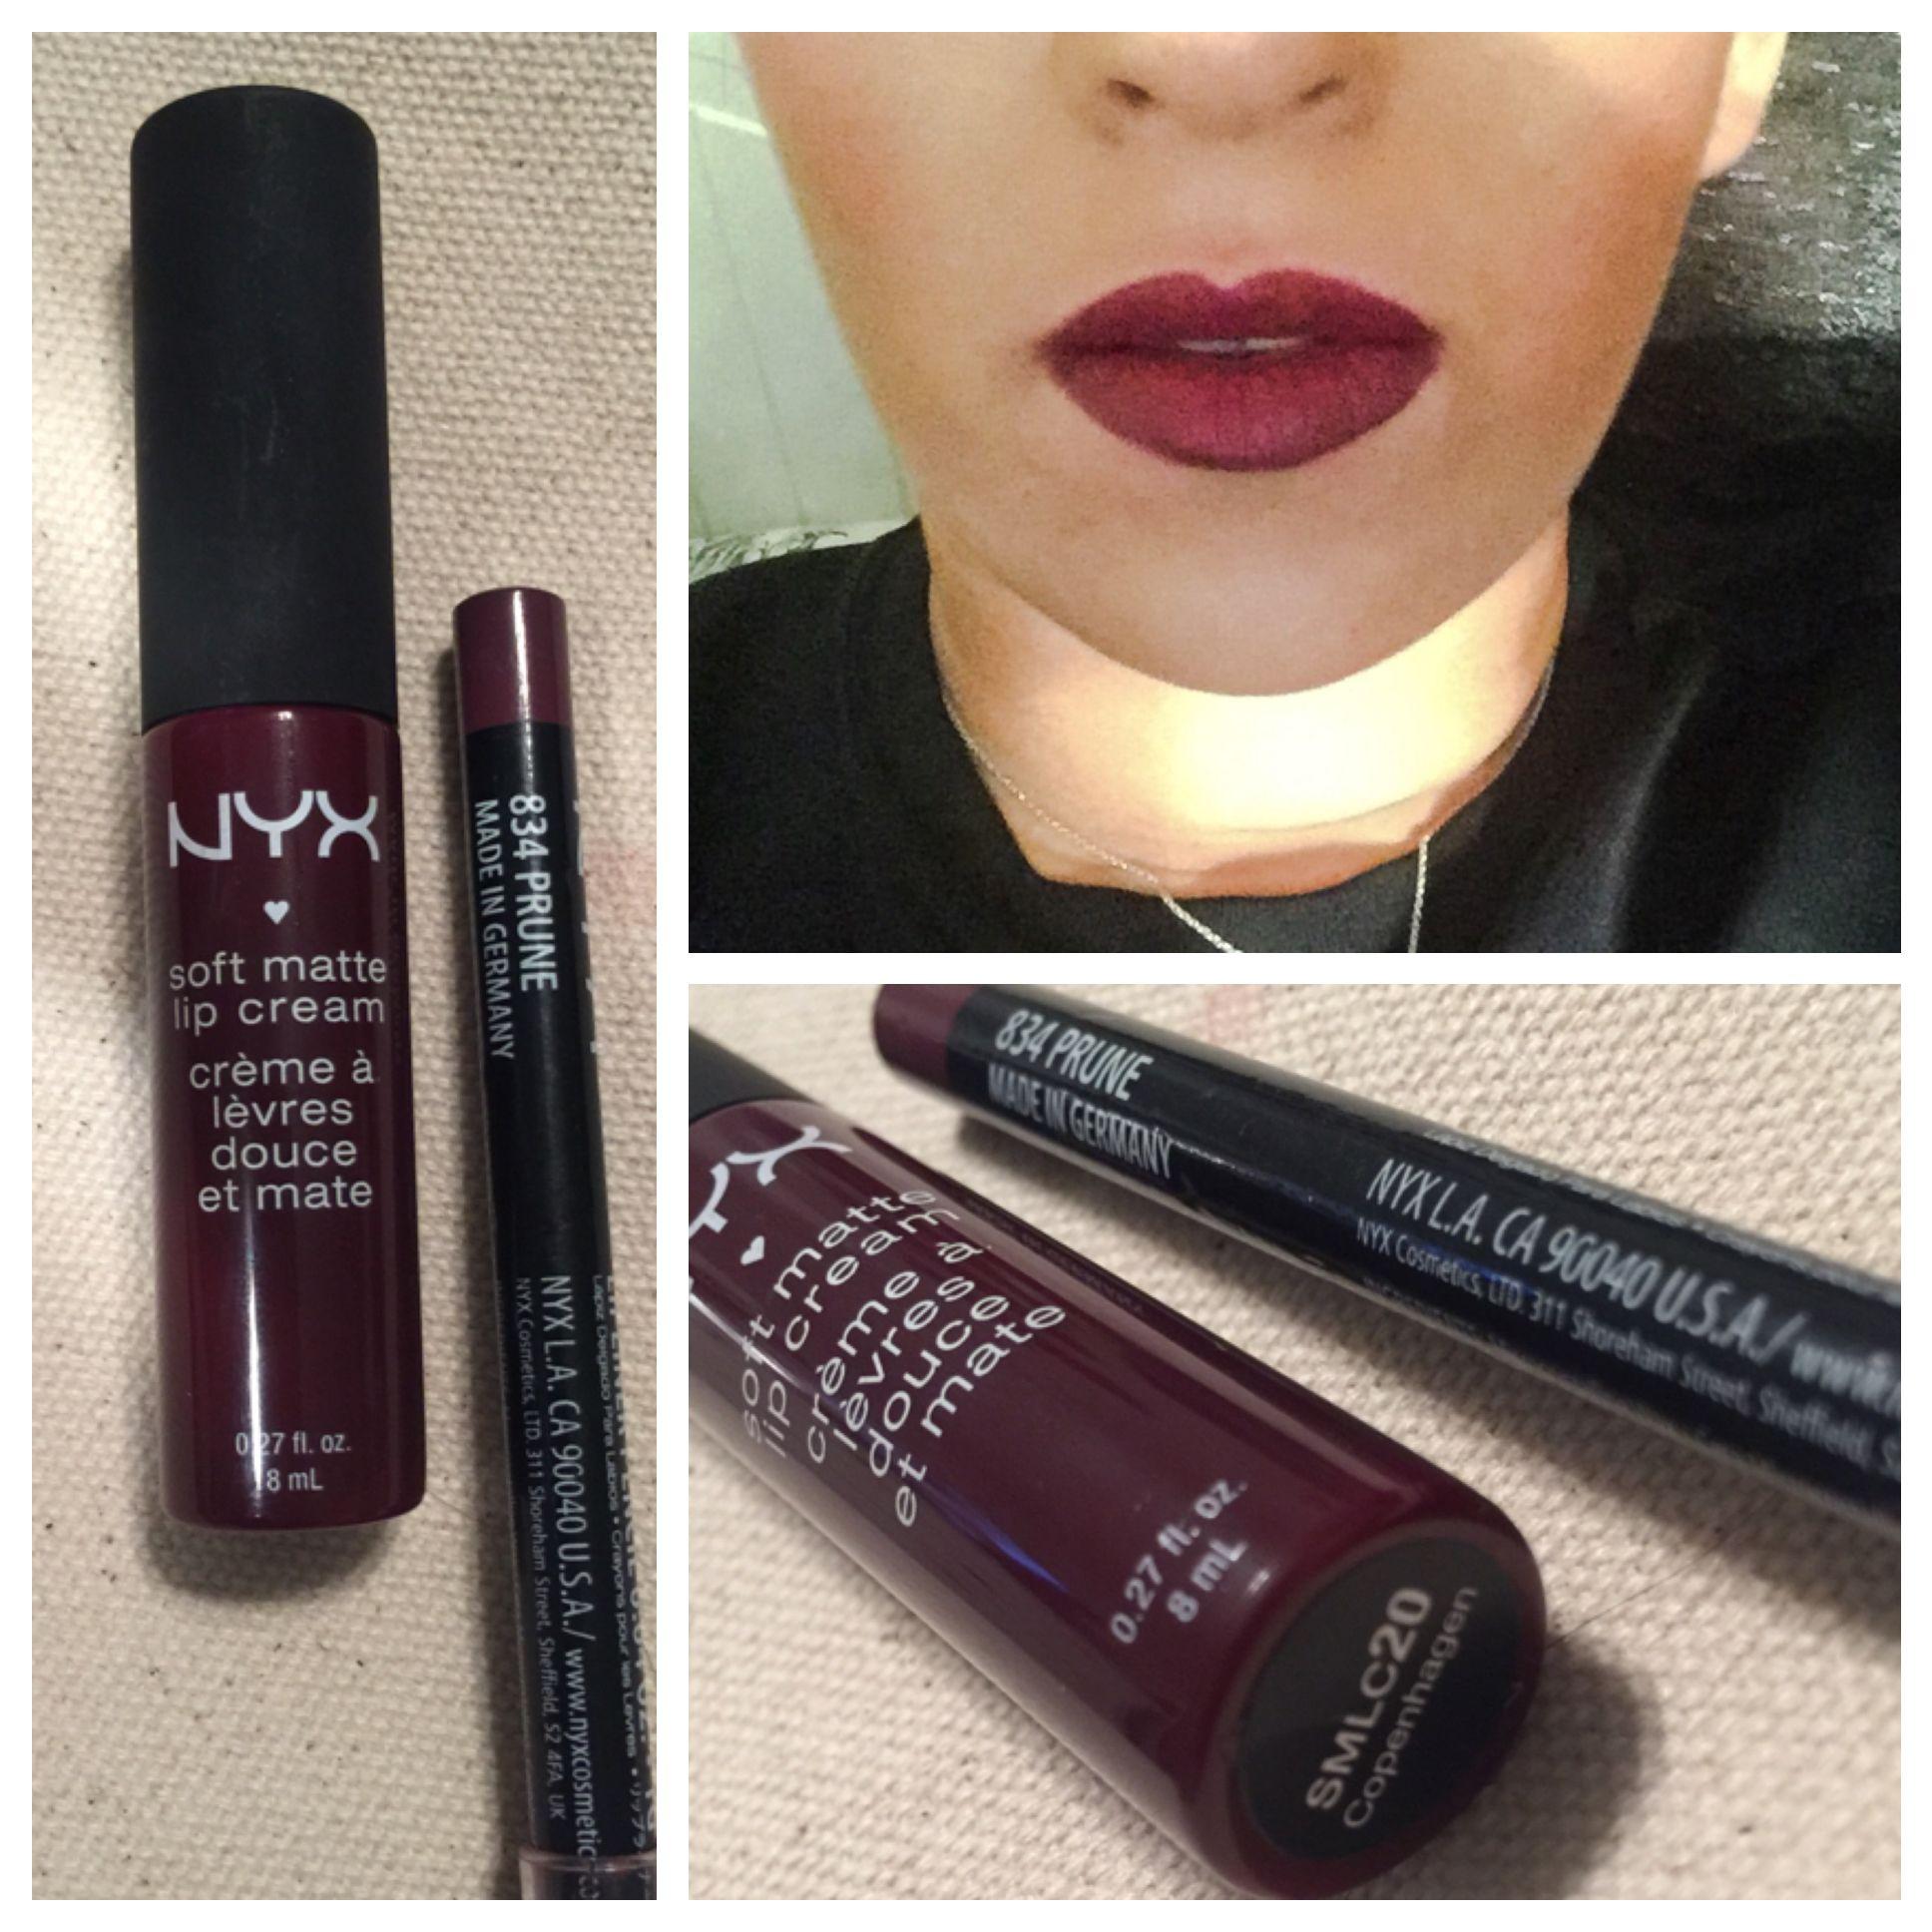 c8aed9d35e Copenhagen nyx soft matte lip cream with bye plum lip liner   Makeup ...